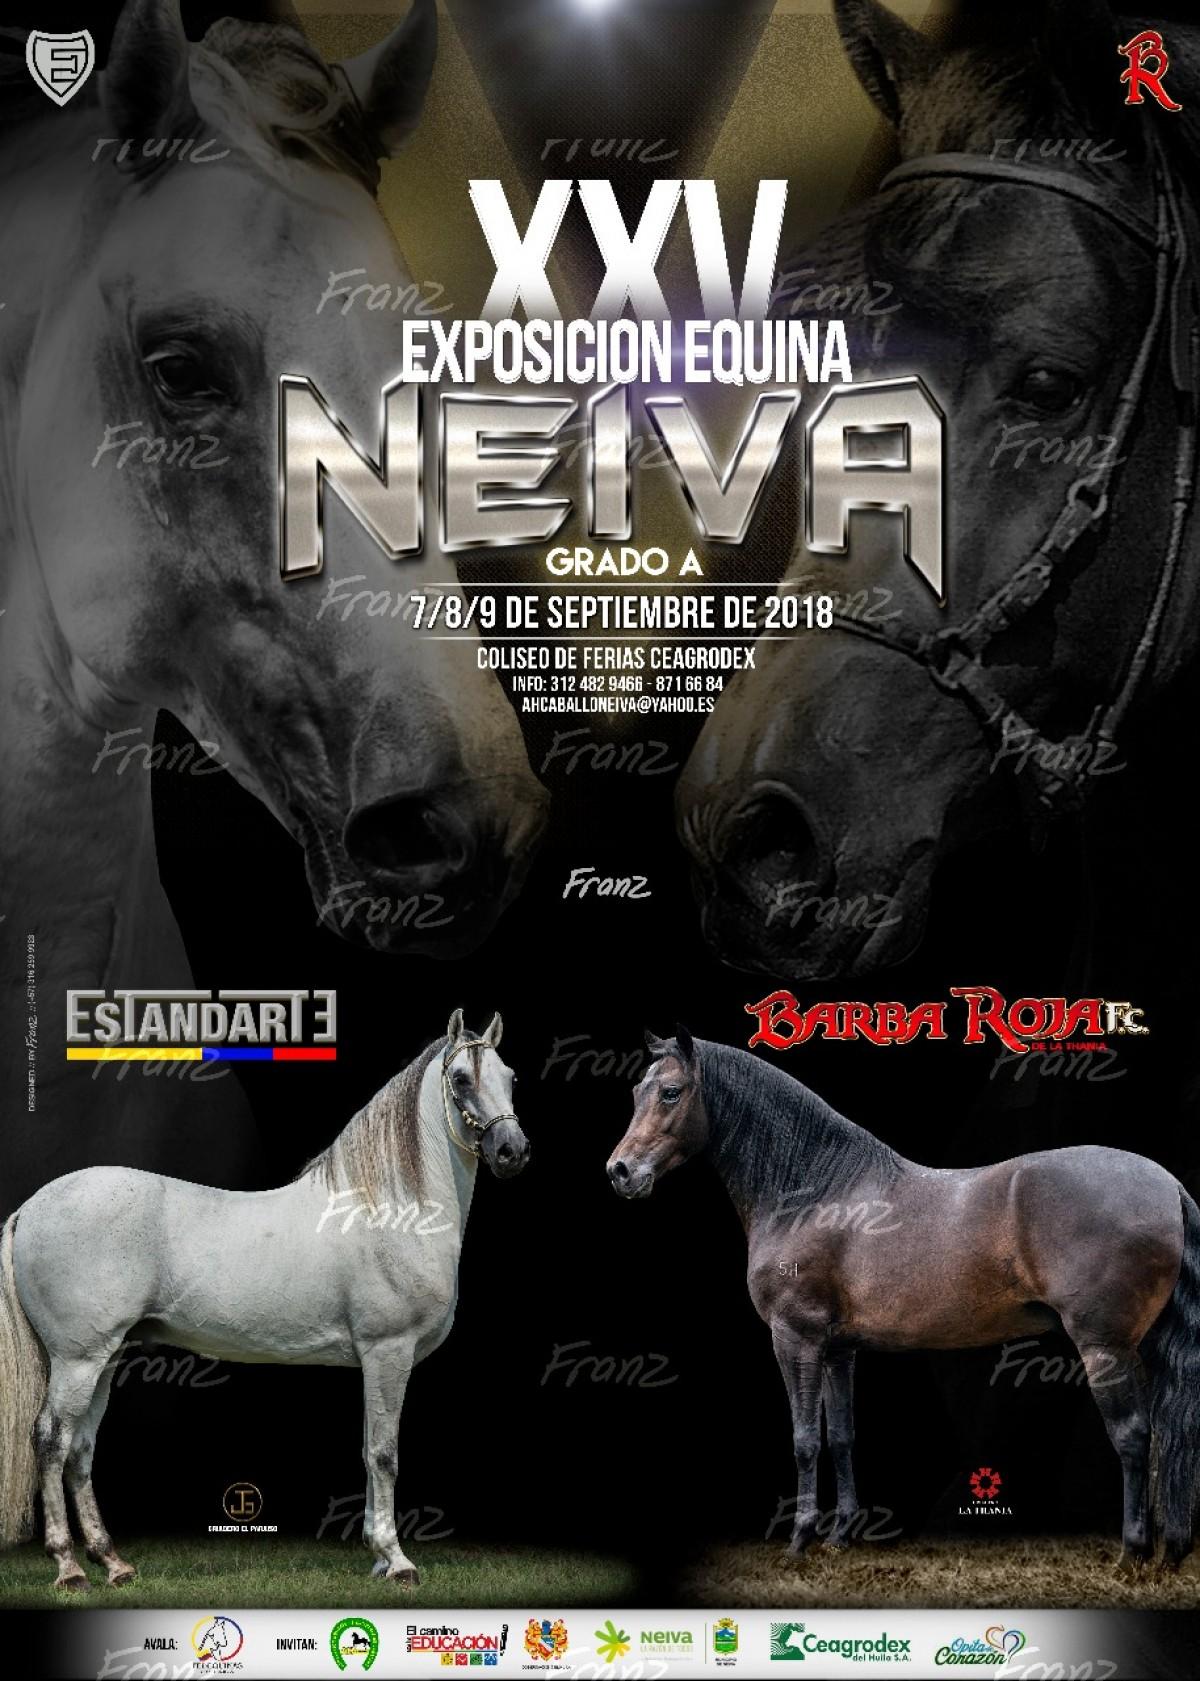 TRANSMISIÓN XXV Exposición Equina Neiva Grado A del 7 al 9 de Septiembre